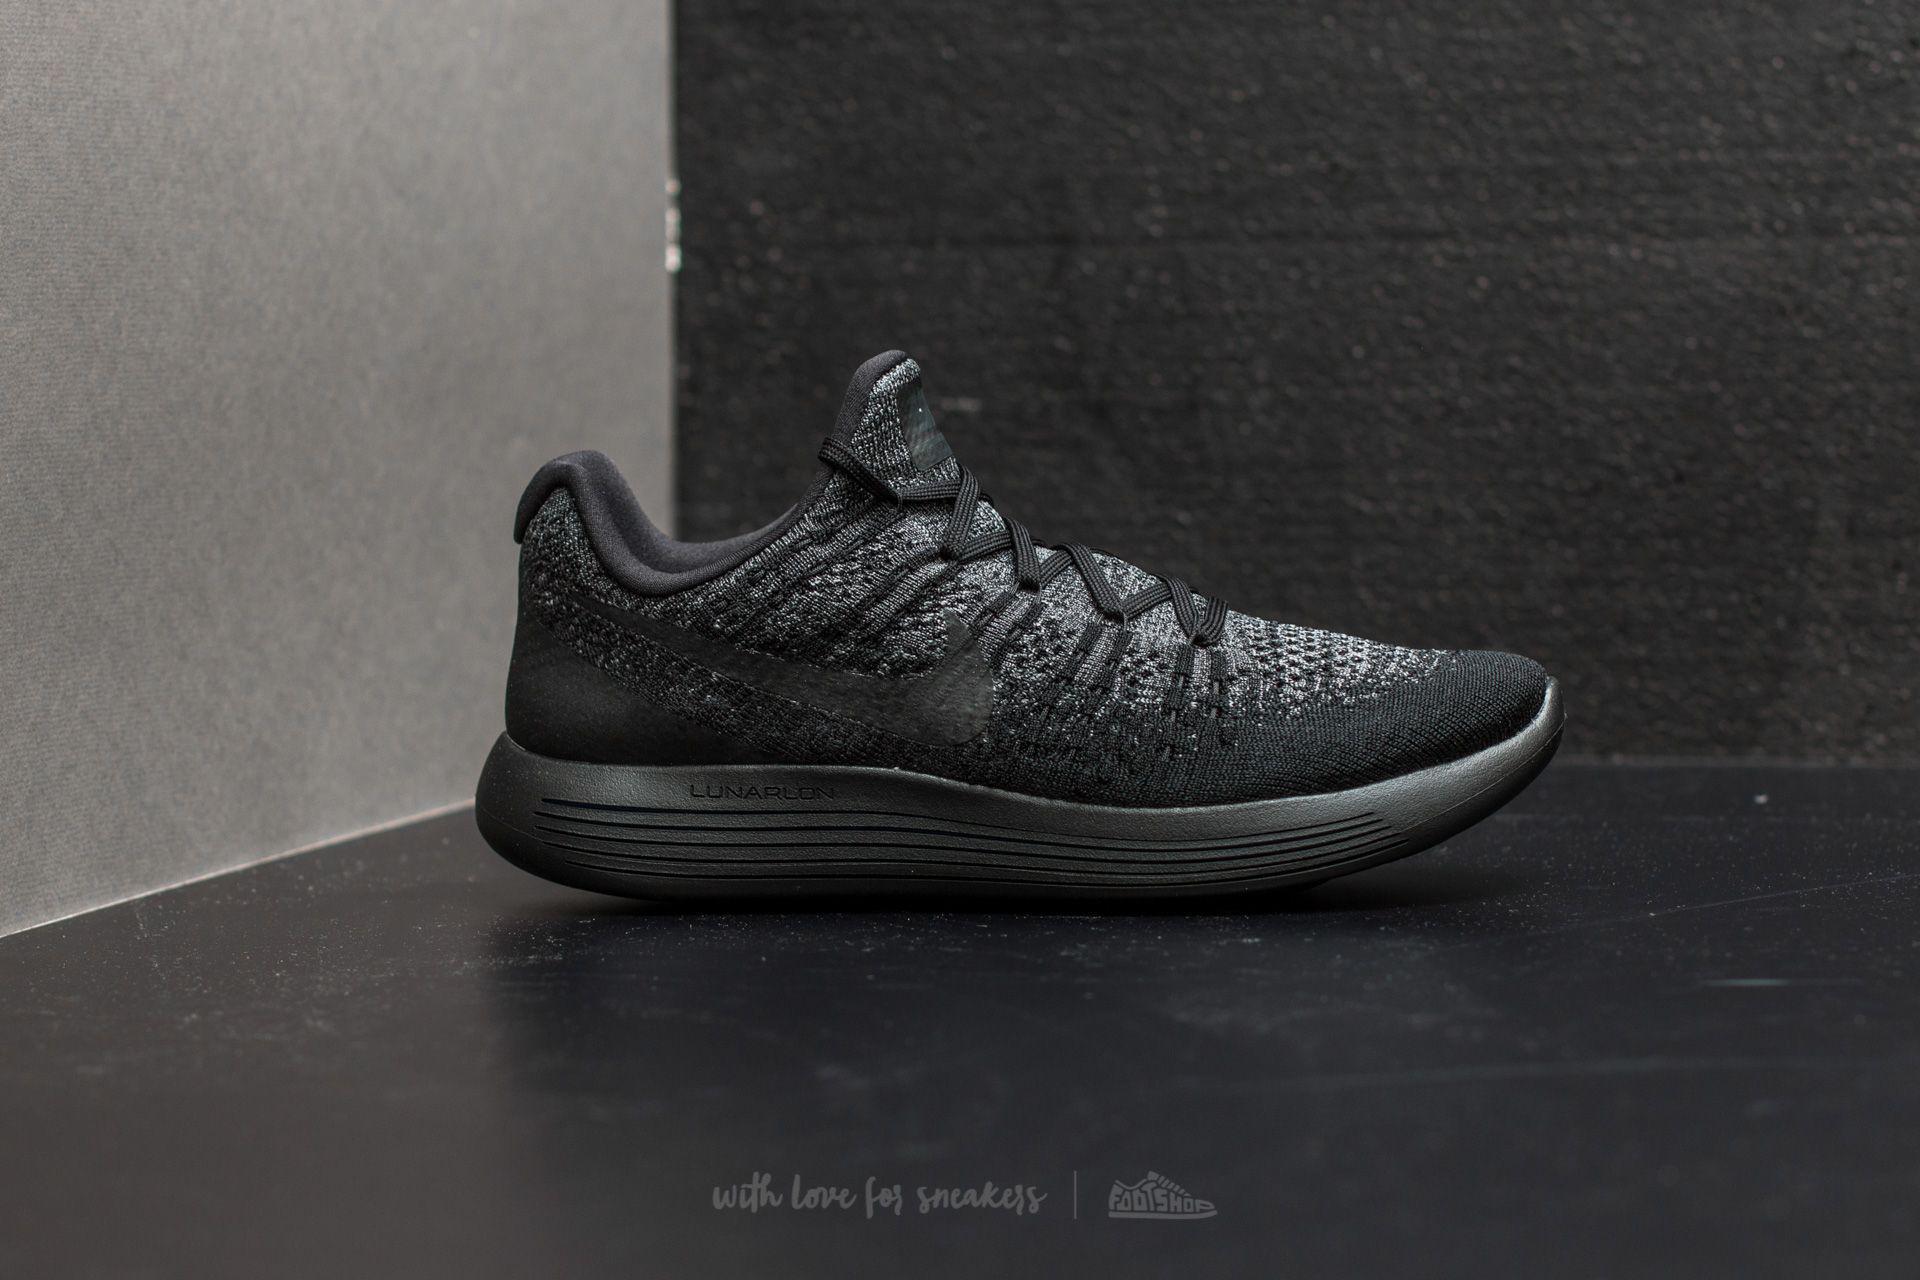 0364d576c8b Lyst - Nike Lunarepic Low Flyknit 2 Black  Black-dark Grey in Black ...